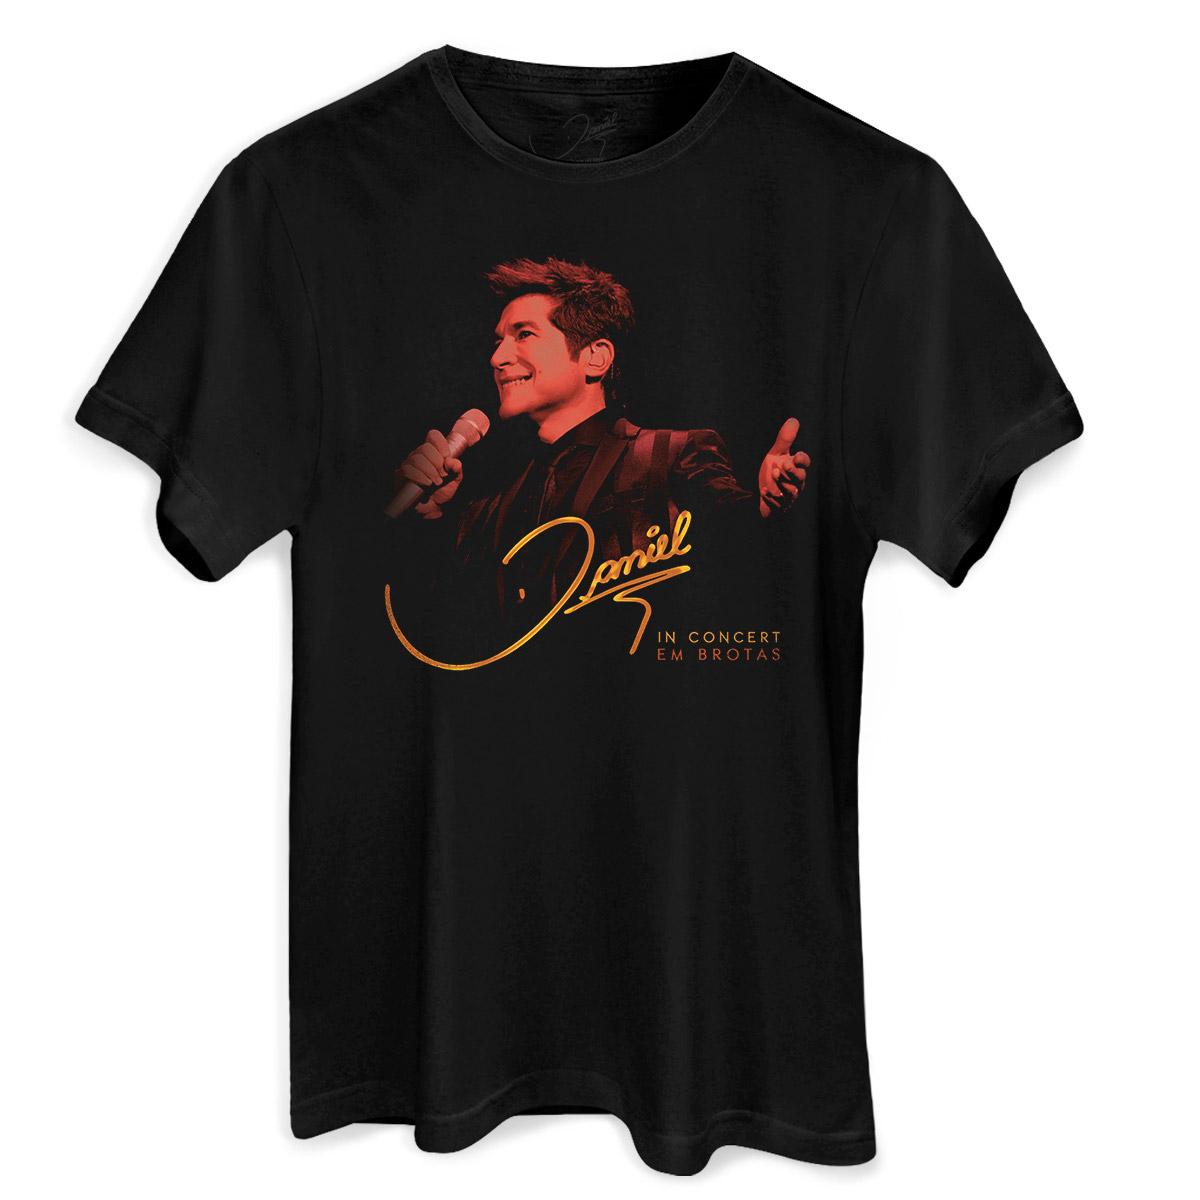 Camiseta Masculina Daniel In Concert